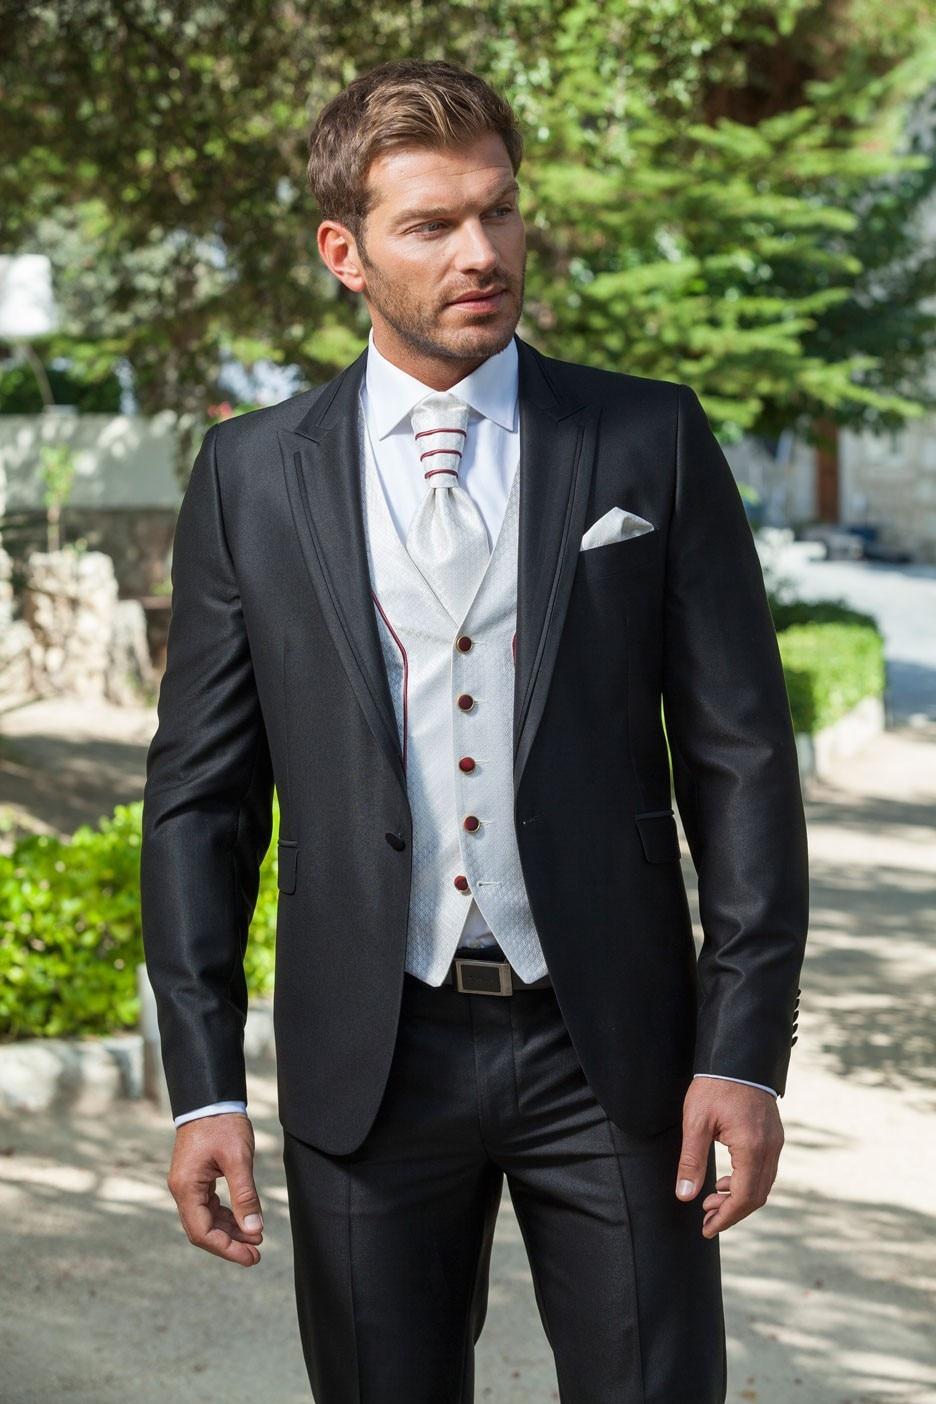 Handsome Designer Customized Charcoal Wedding Ceremony Suit Groom Tuxedos Bridegroom And Groomsman Suit Jacket+Pants+Tie+Vest